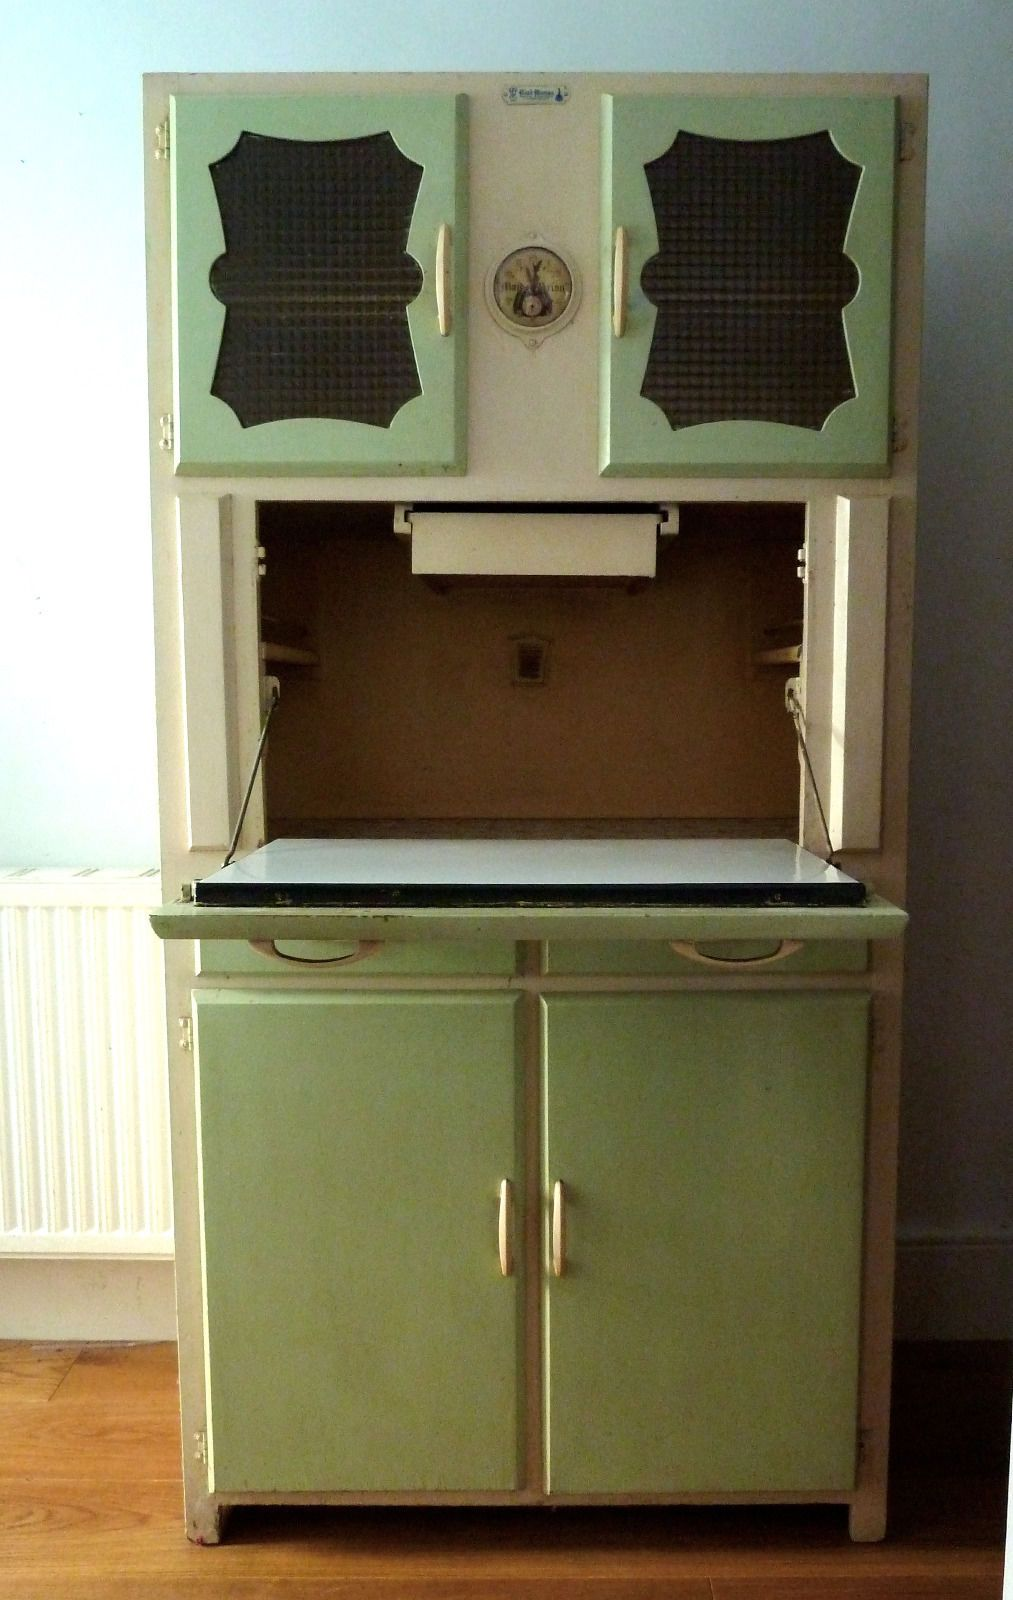 Vintage Maid Marion Retro Kitchen Kitchenette Unit 1950s 1960s